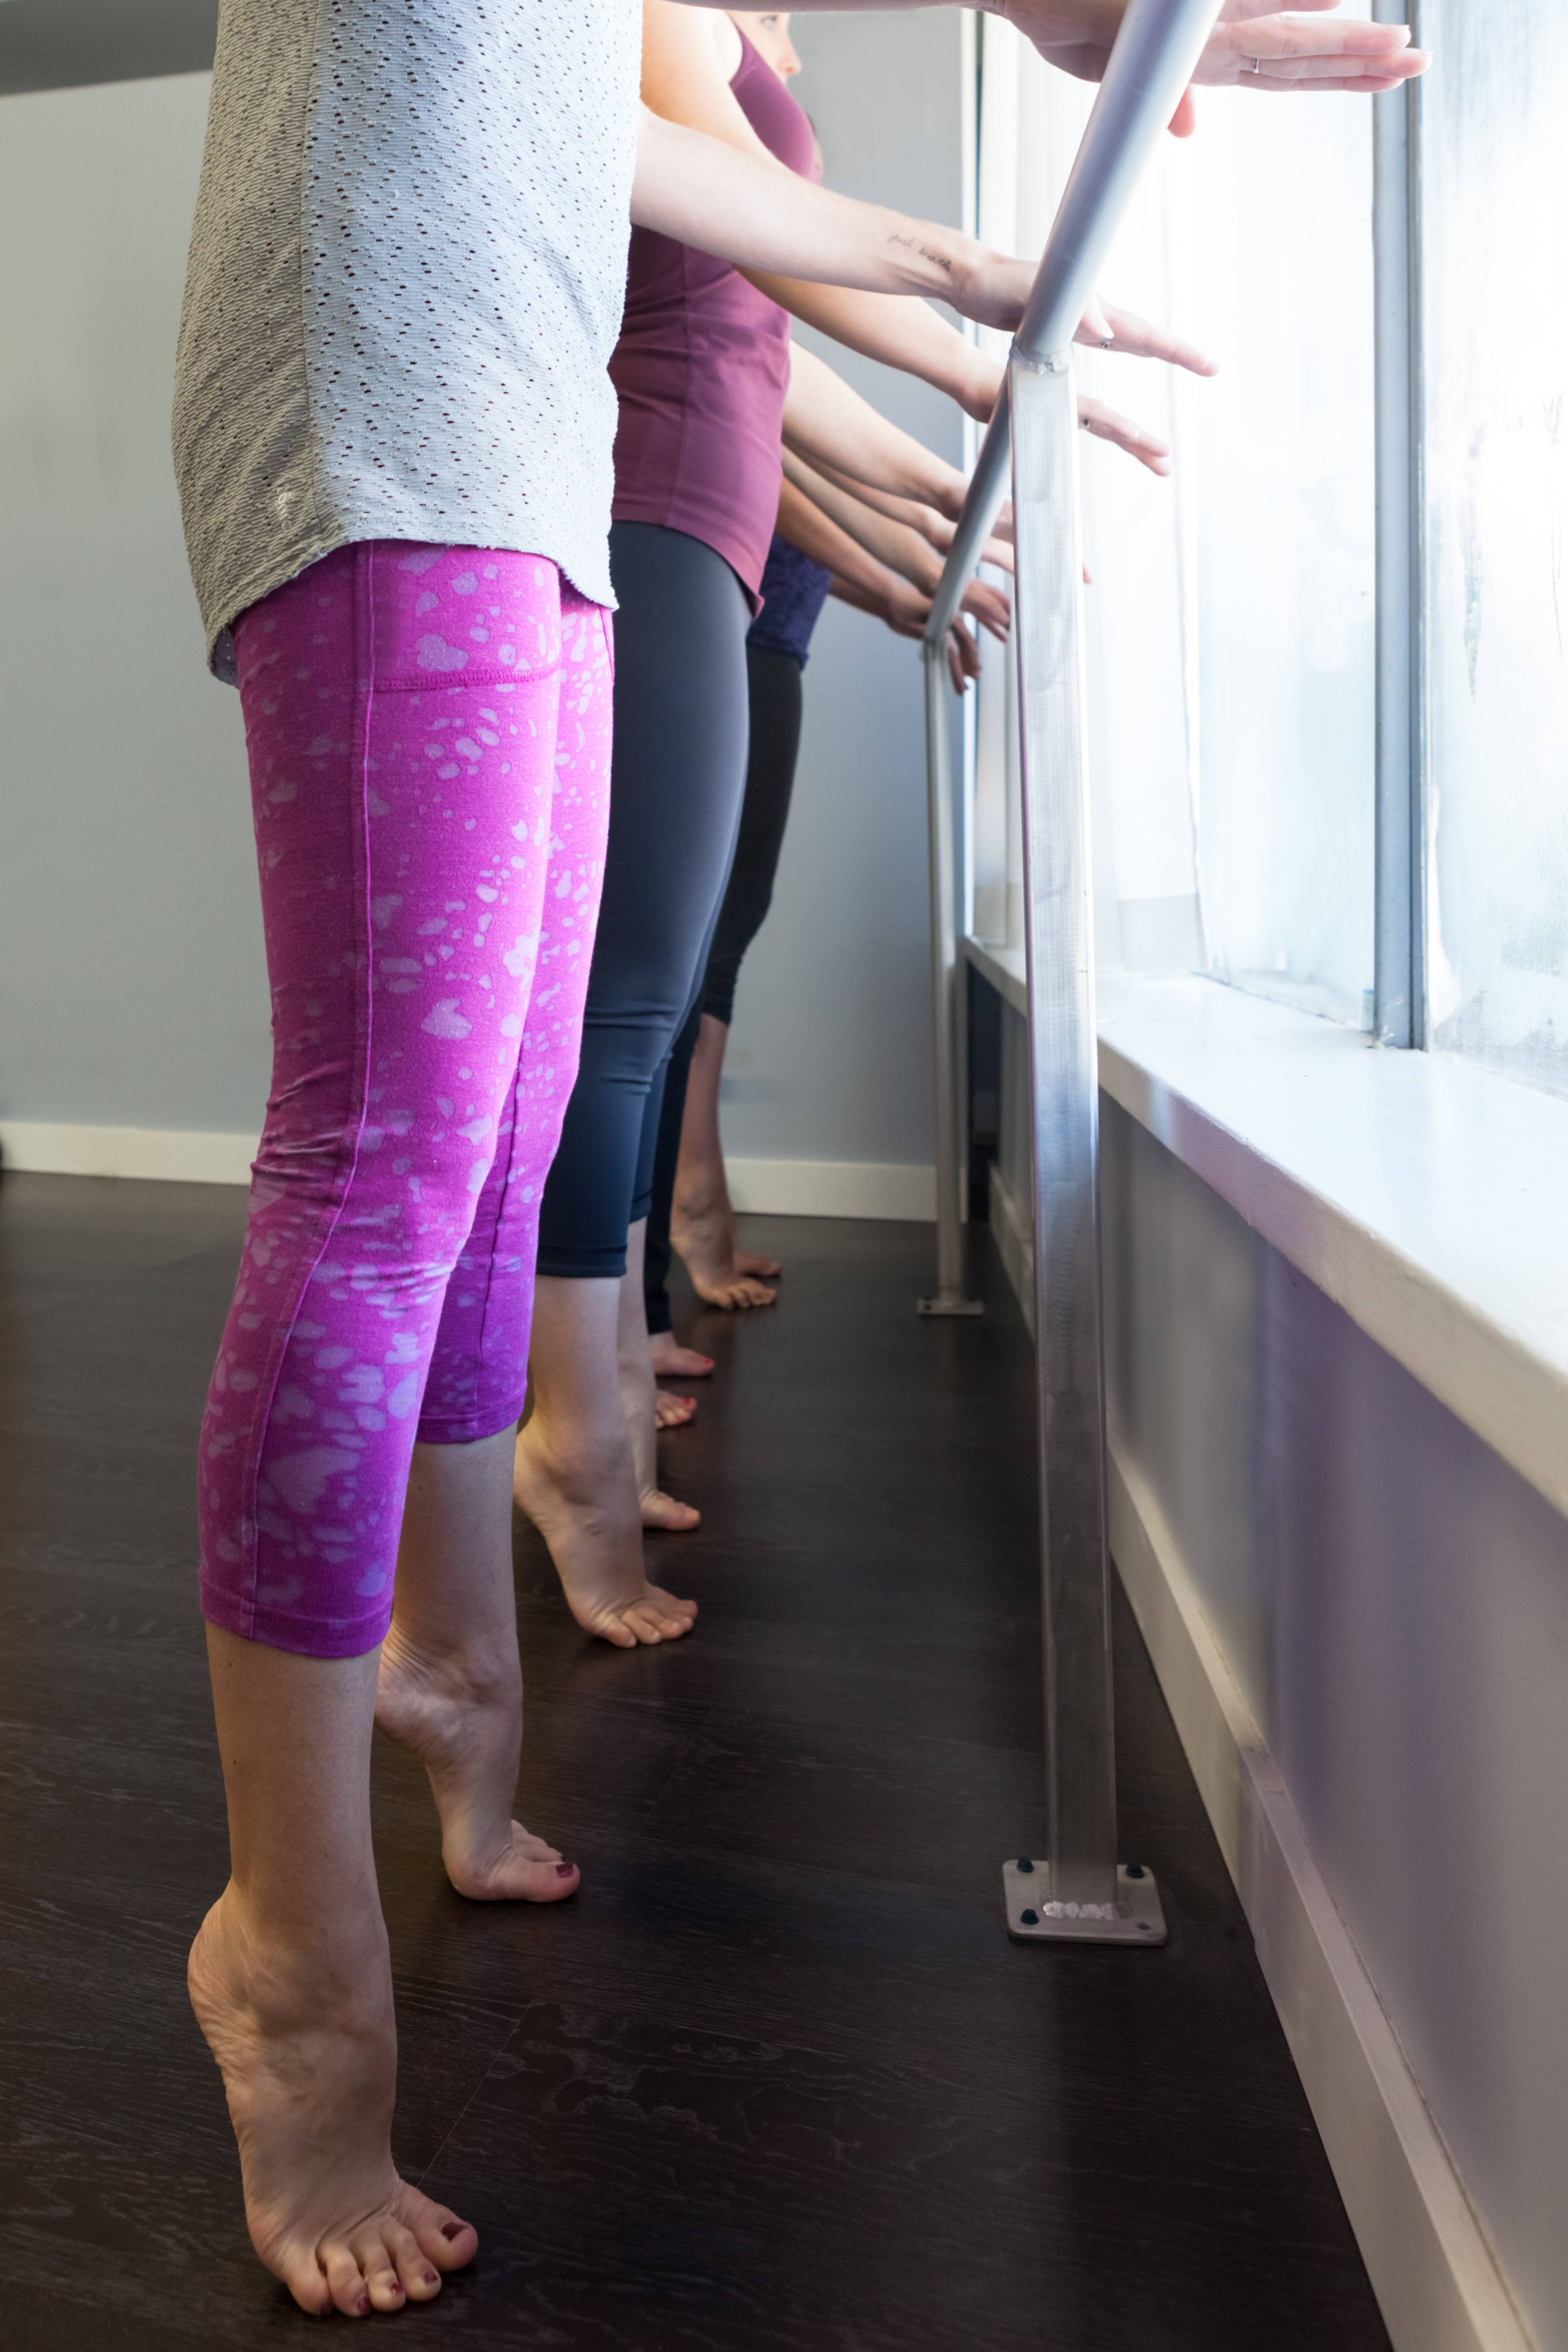 Ballet Barre Workout Thursdays, 8:15